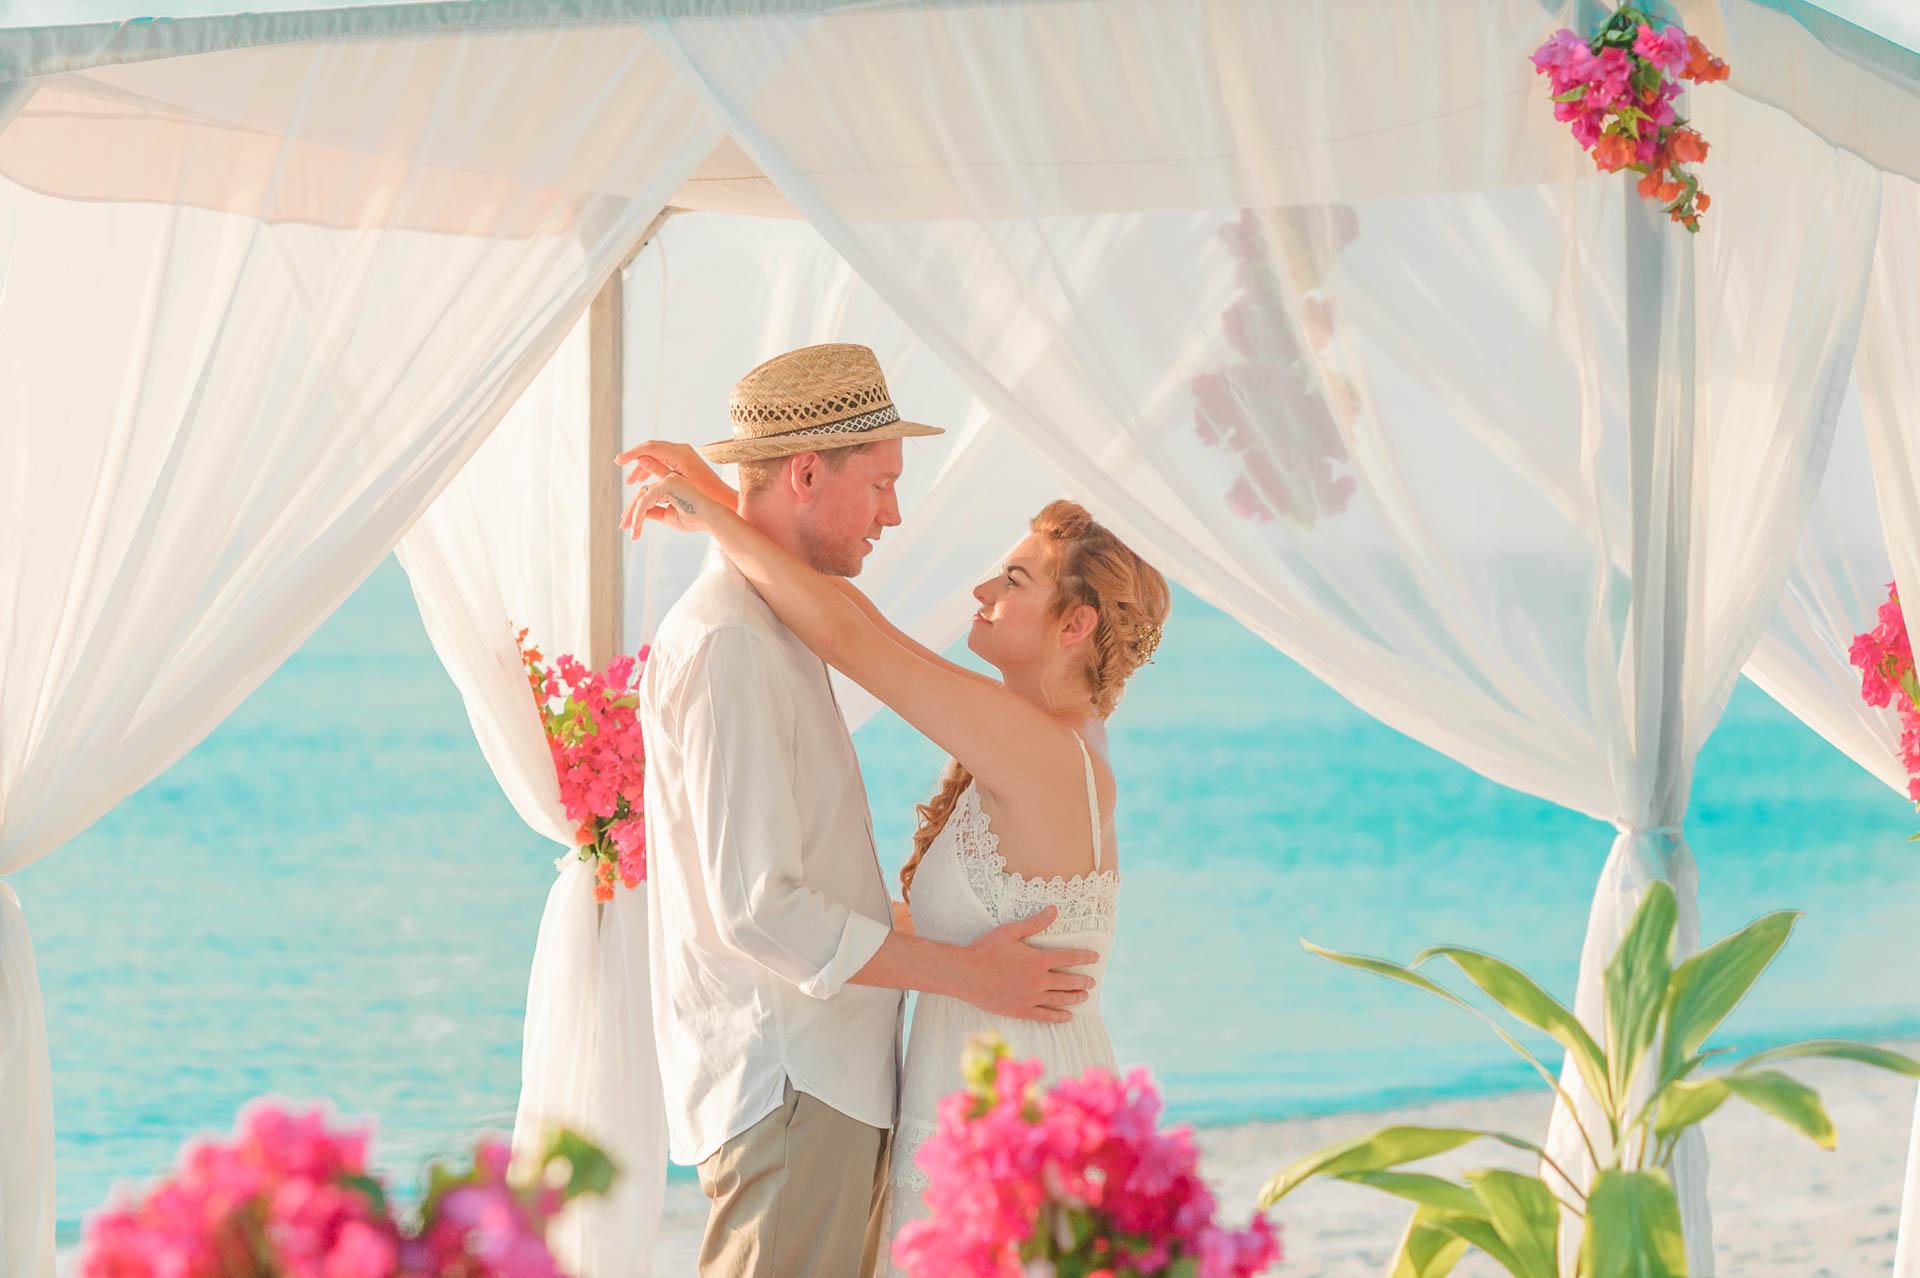 Heike Michaels Beach Wedding in Maldives 41